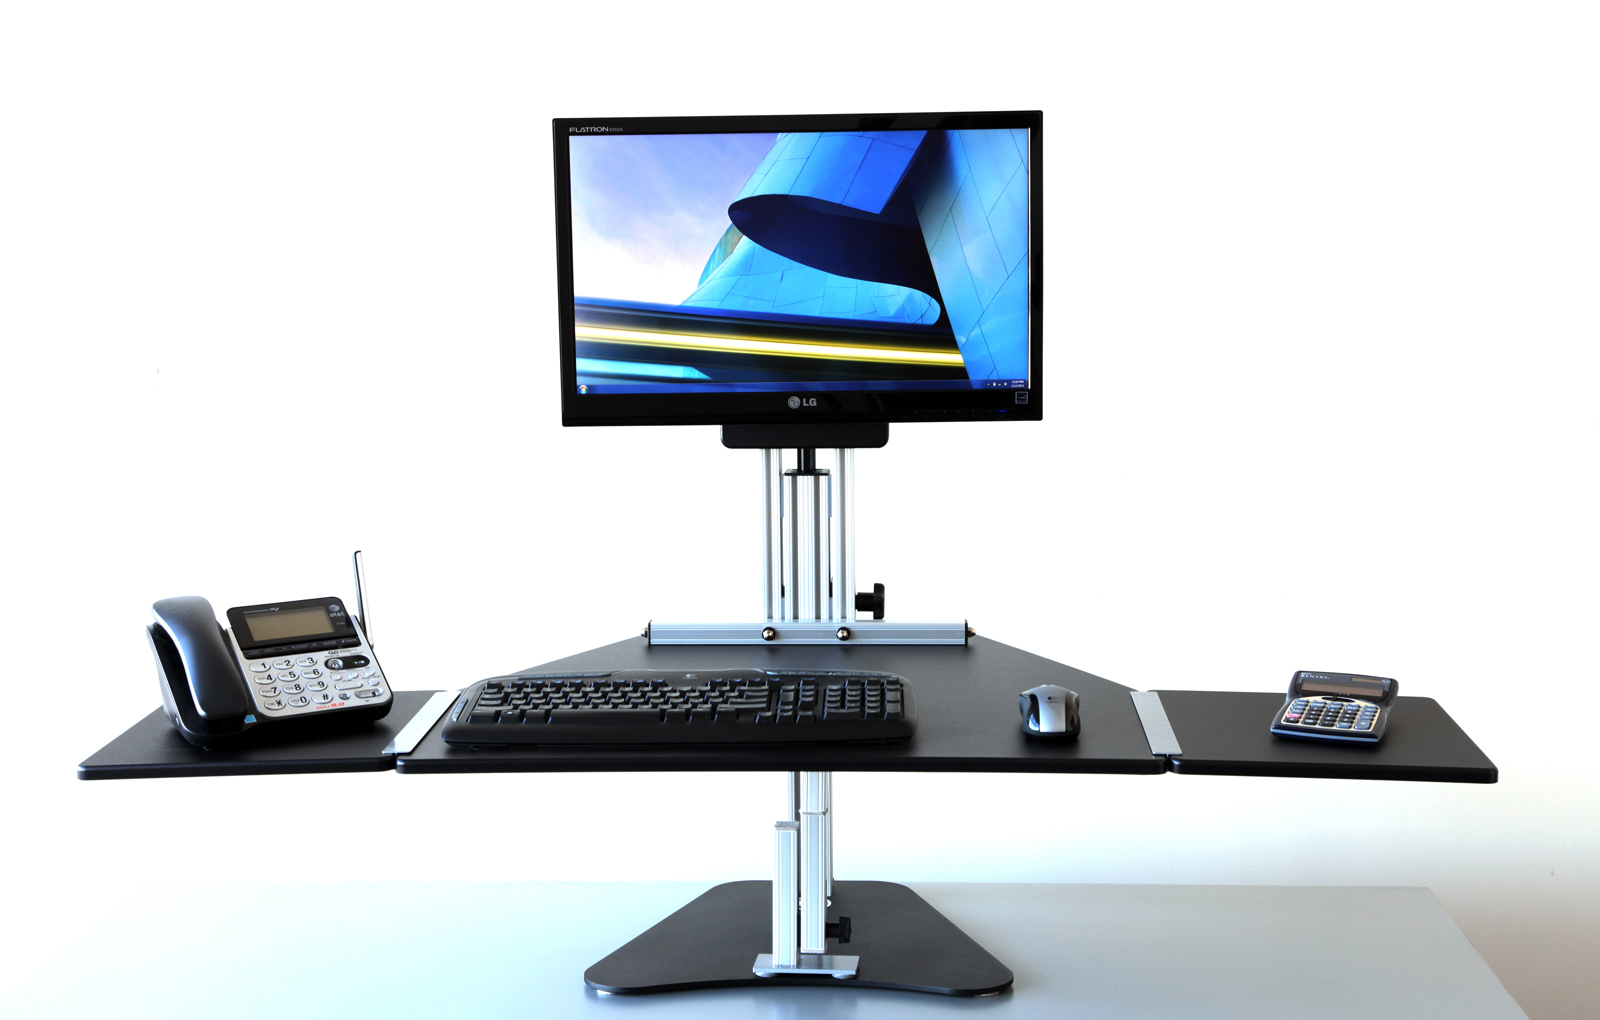 Ergo Desktop Height Adjustable Desk Kangaroo Pro